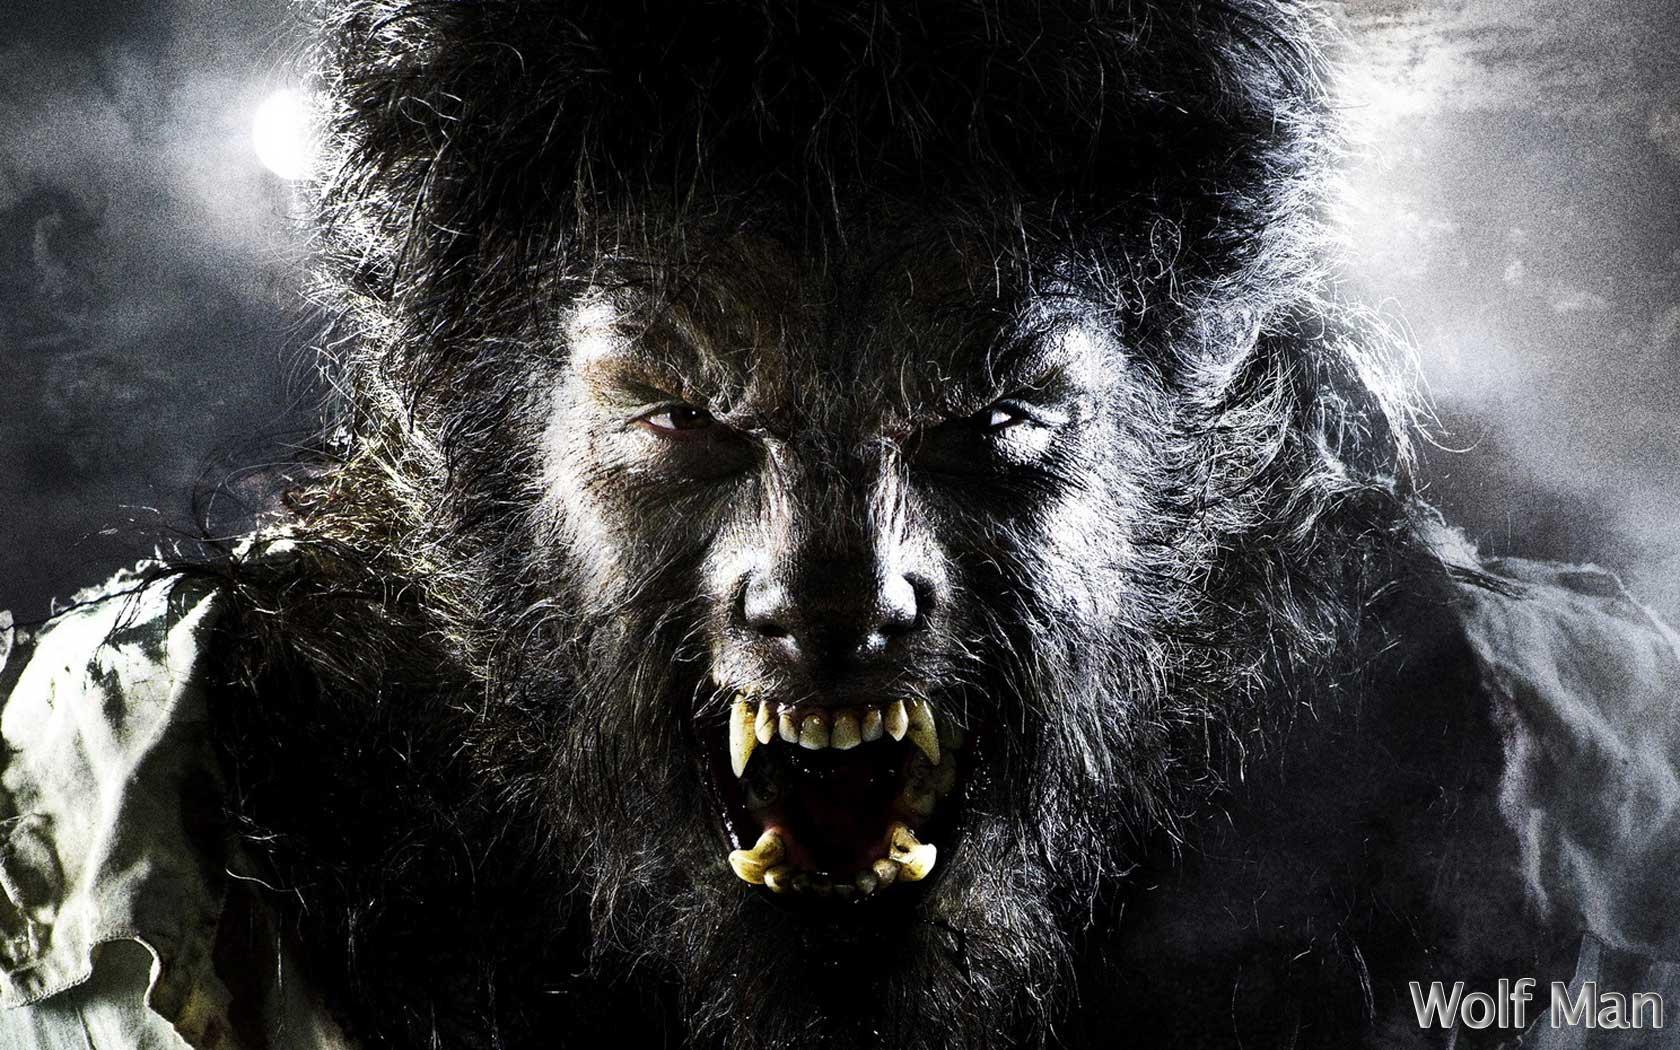 Van Helsing Werewolf Wallpaper wallpaper Van Helsing Werewolf 1680x1050